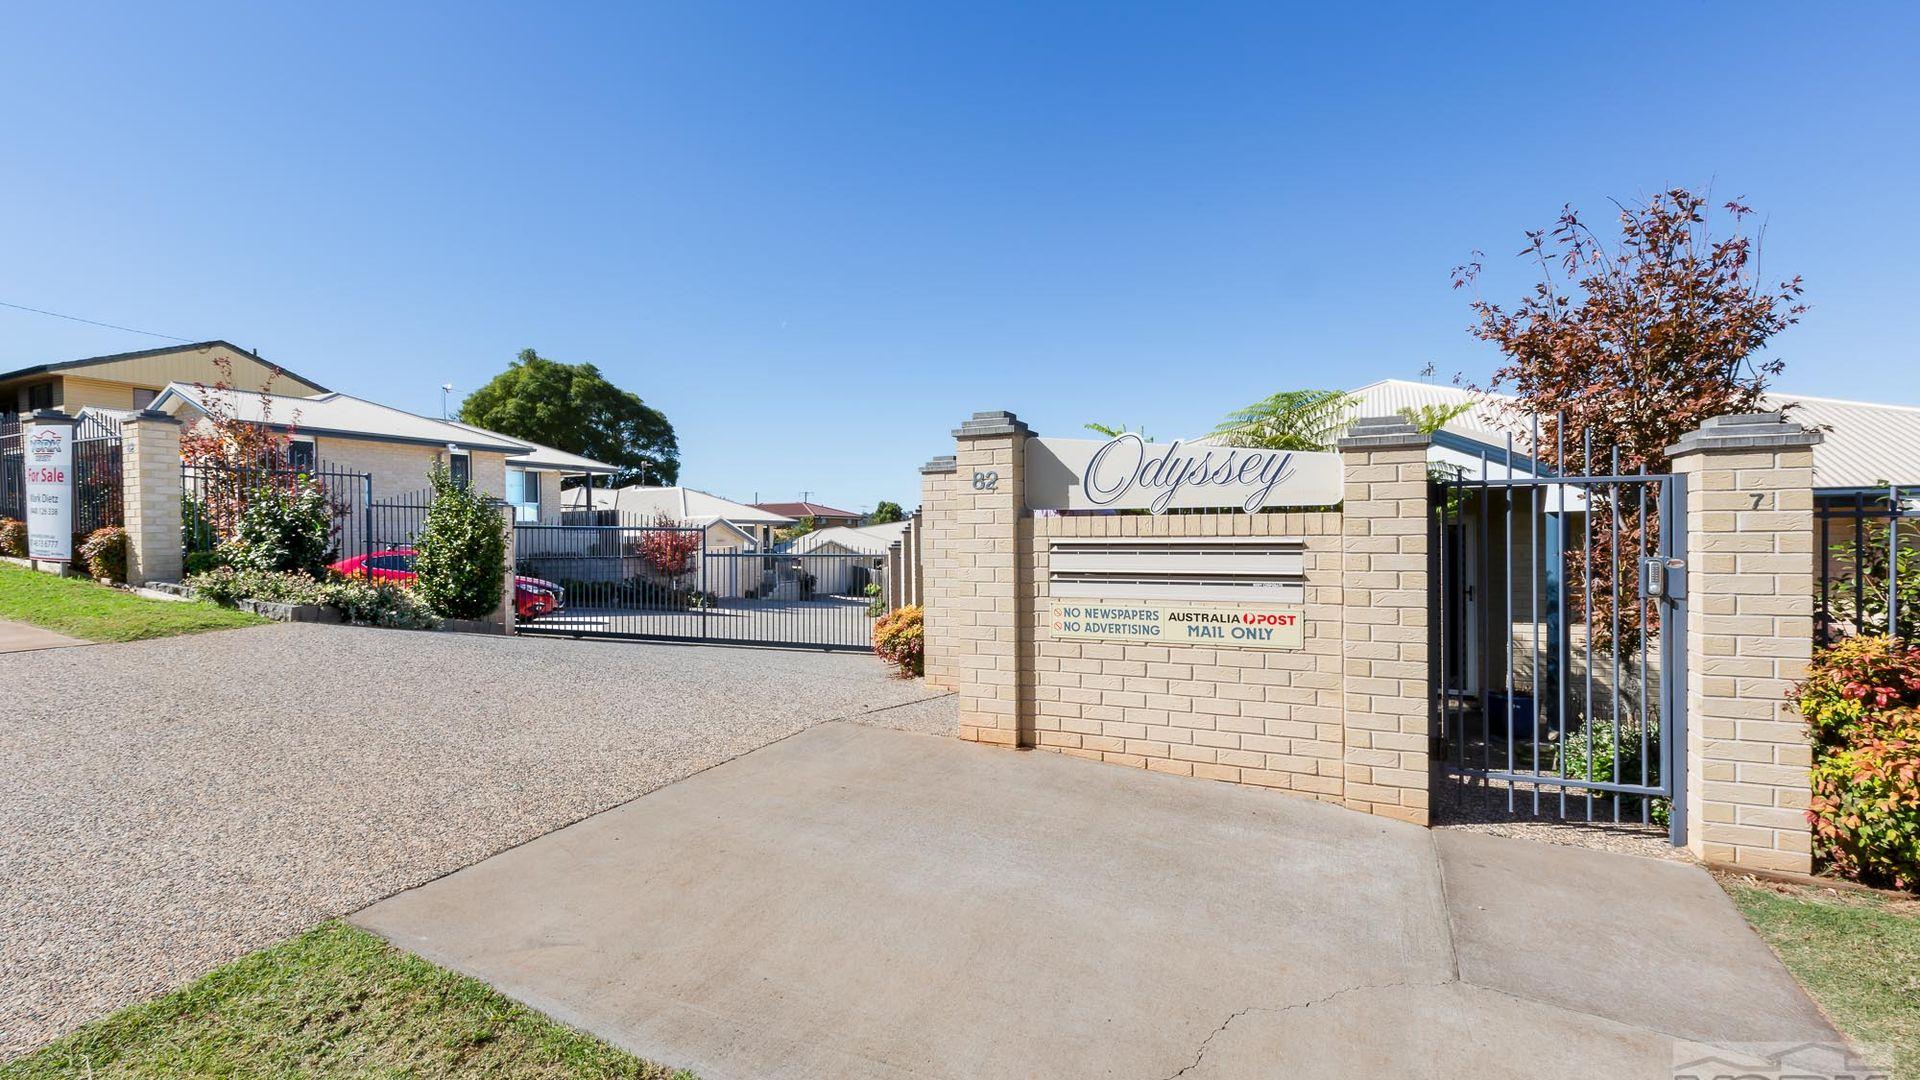 6/82 Holberton Street, Rockville QLD 4350, Image 2